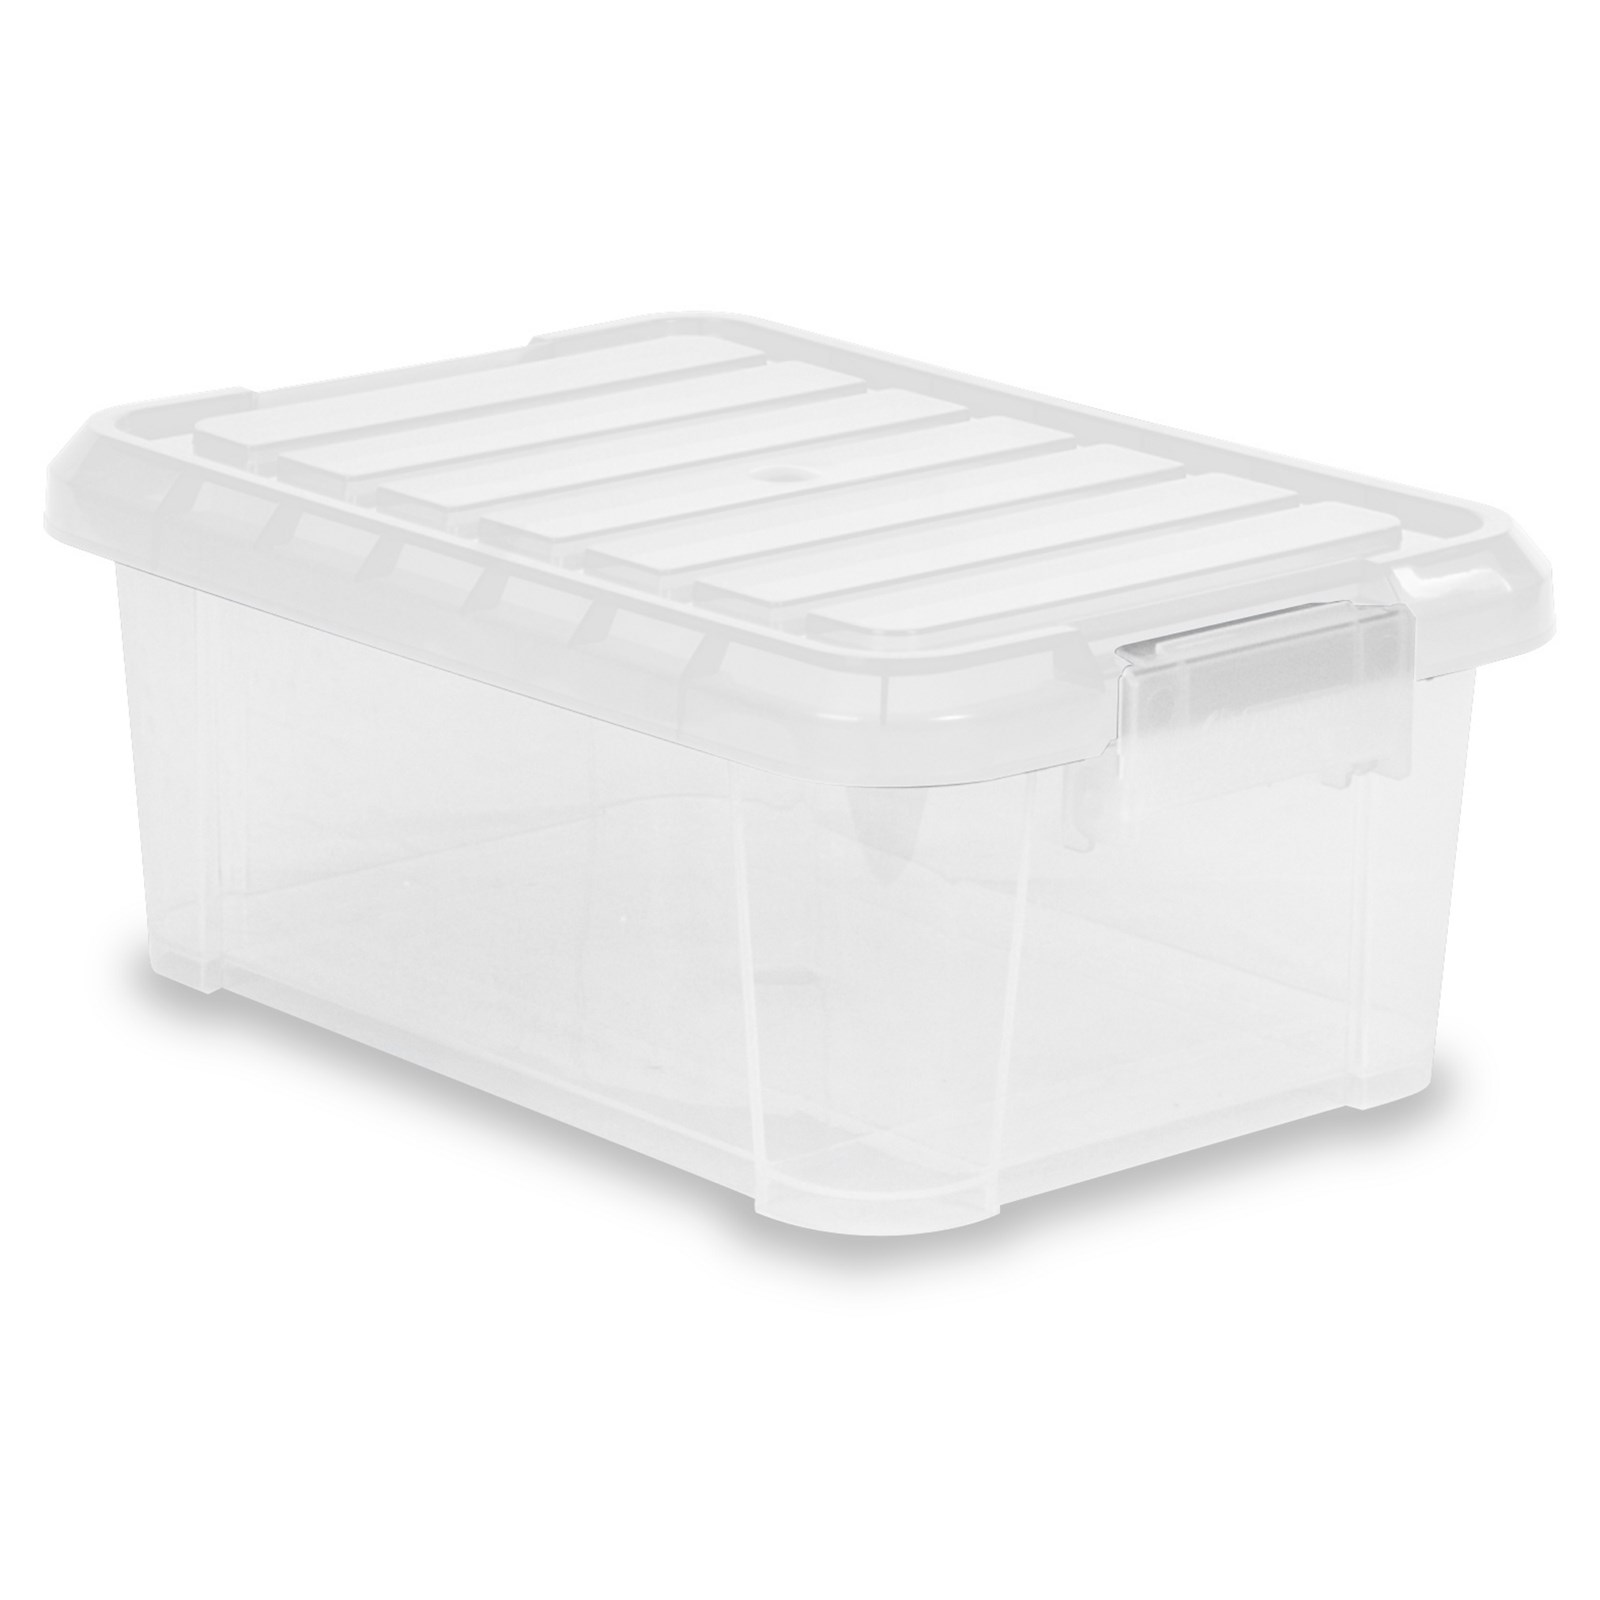 Araven Food Box with Lid 9L